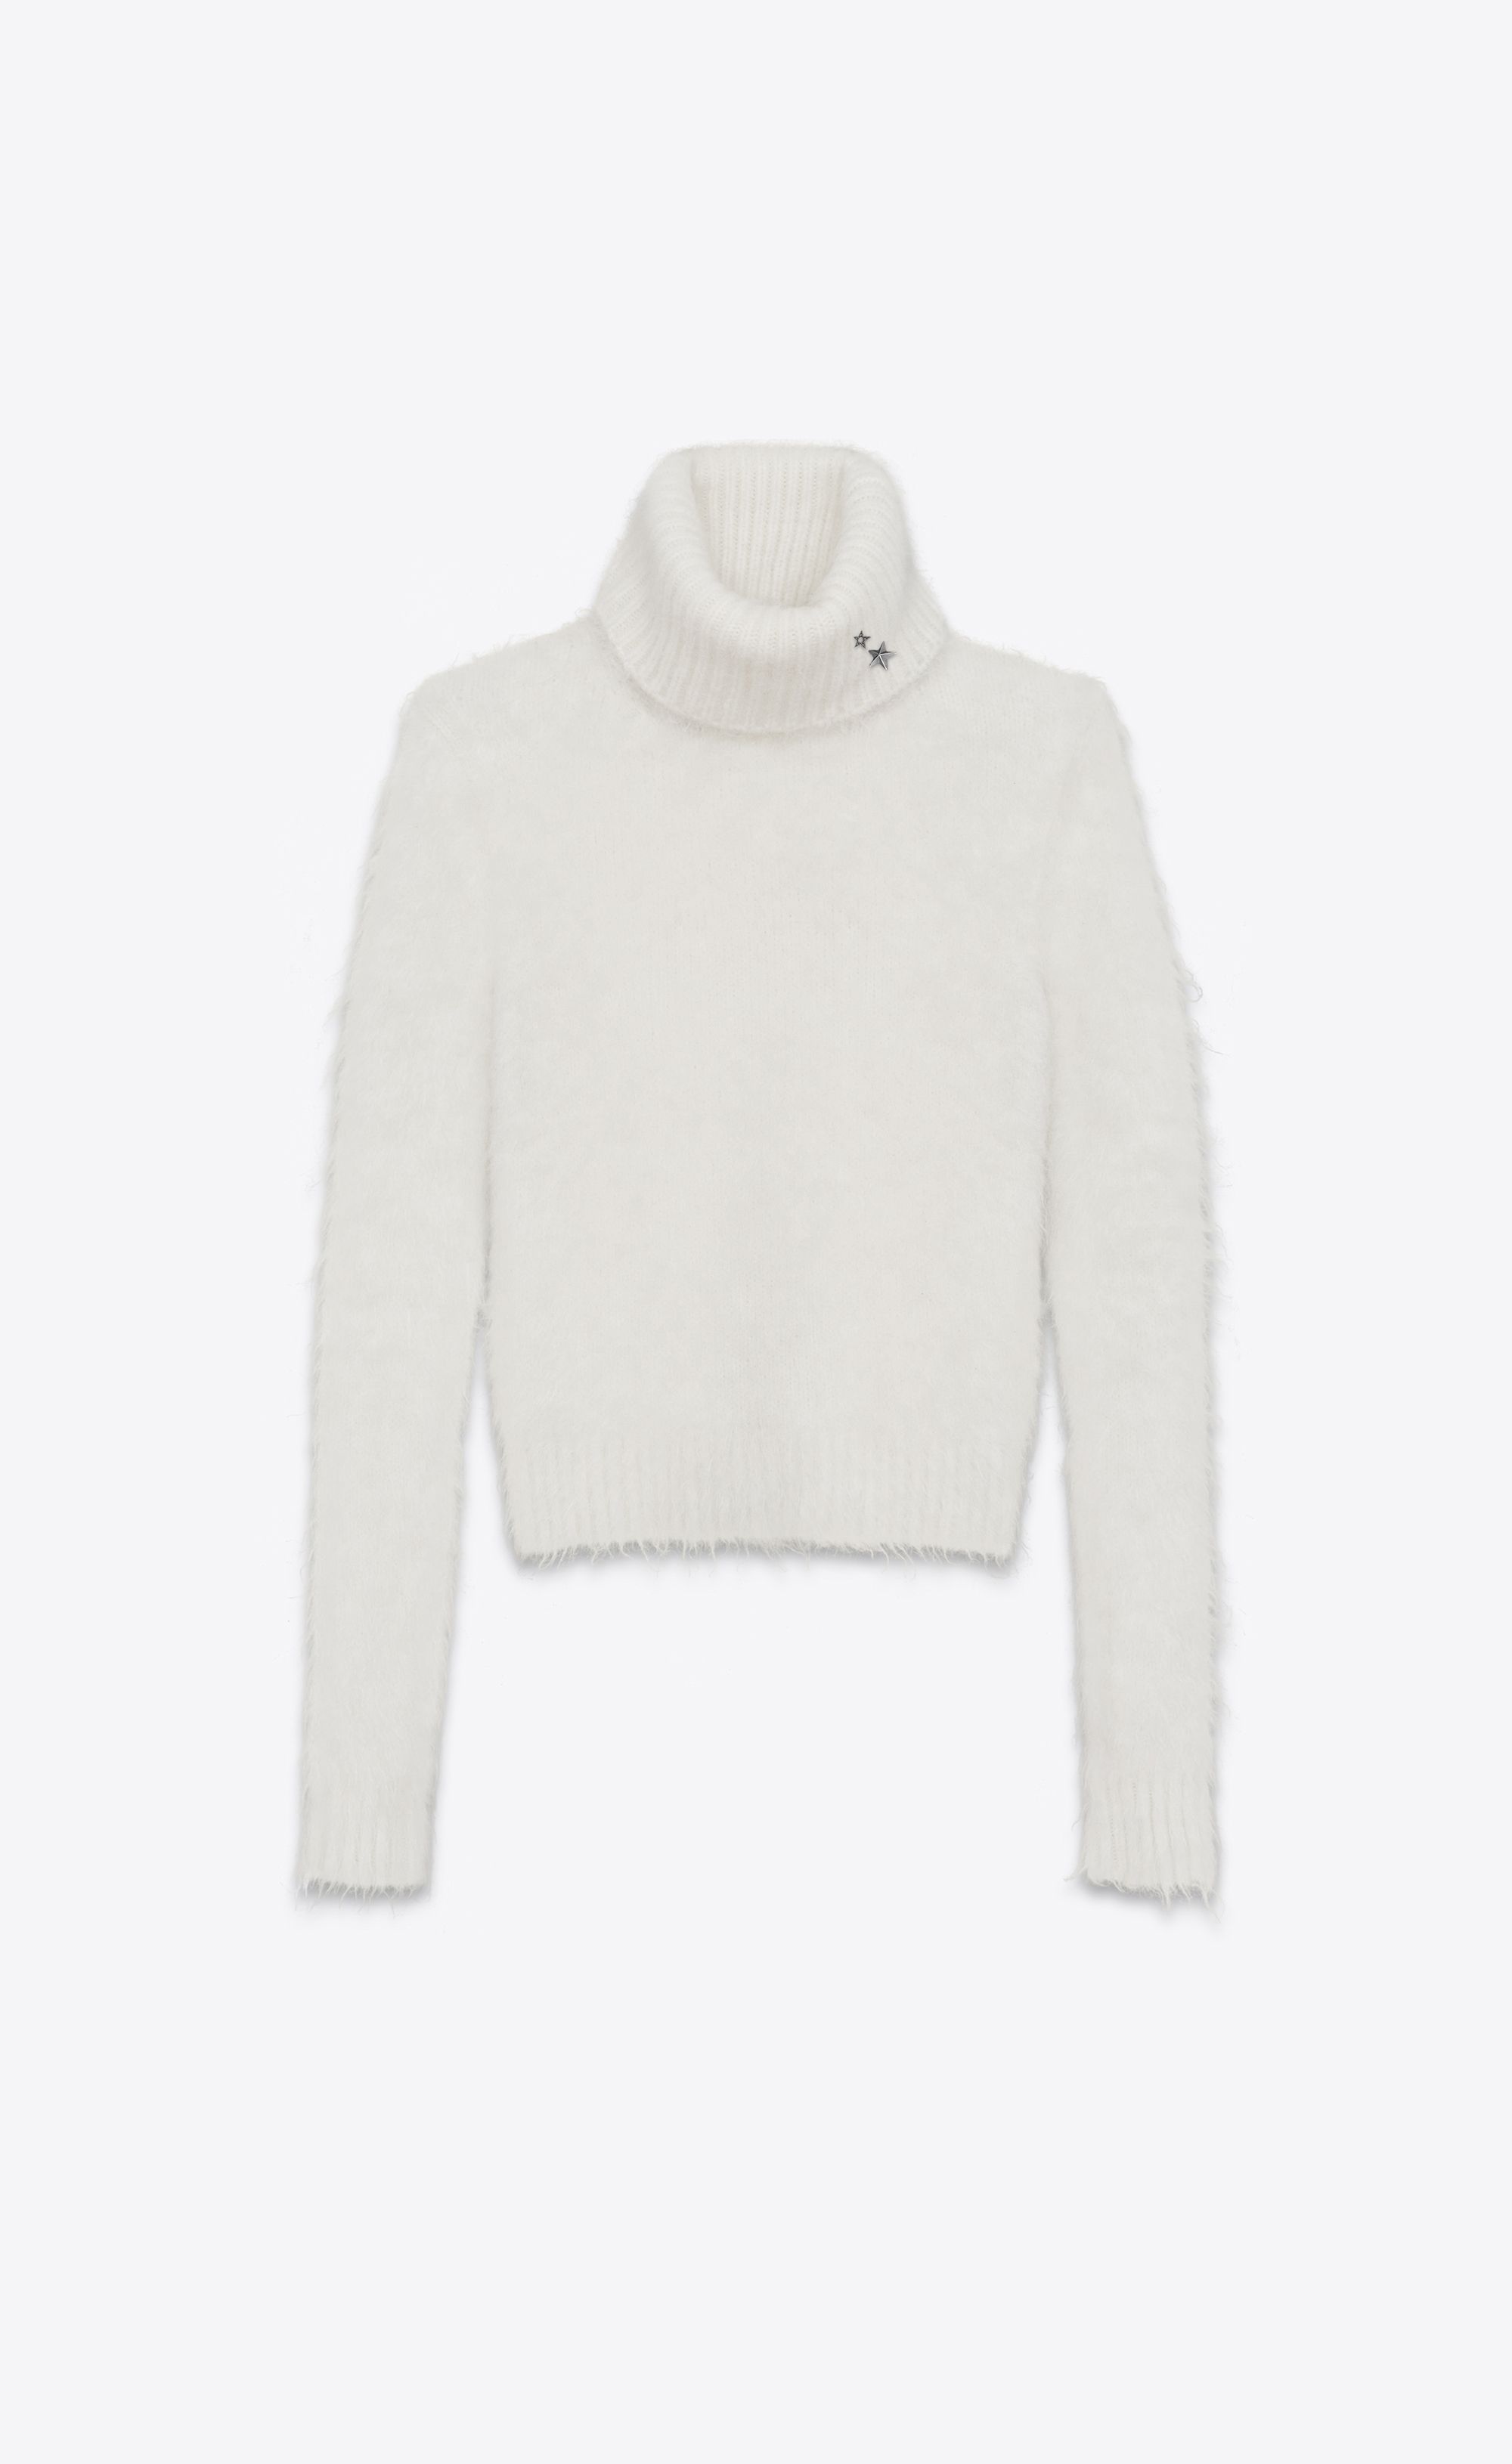 Women's Knitwear | Saint Laurent | YSL.com